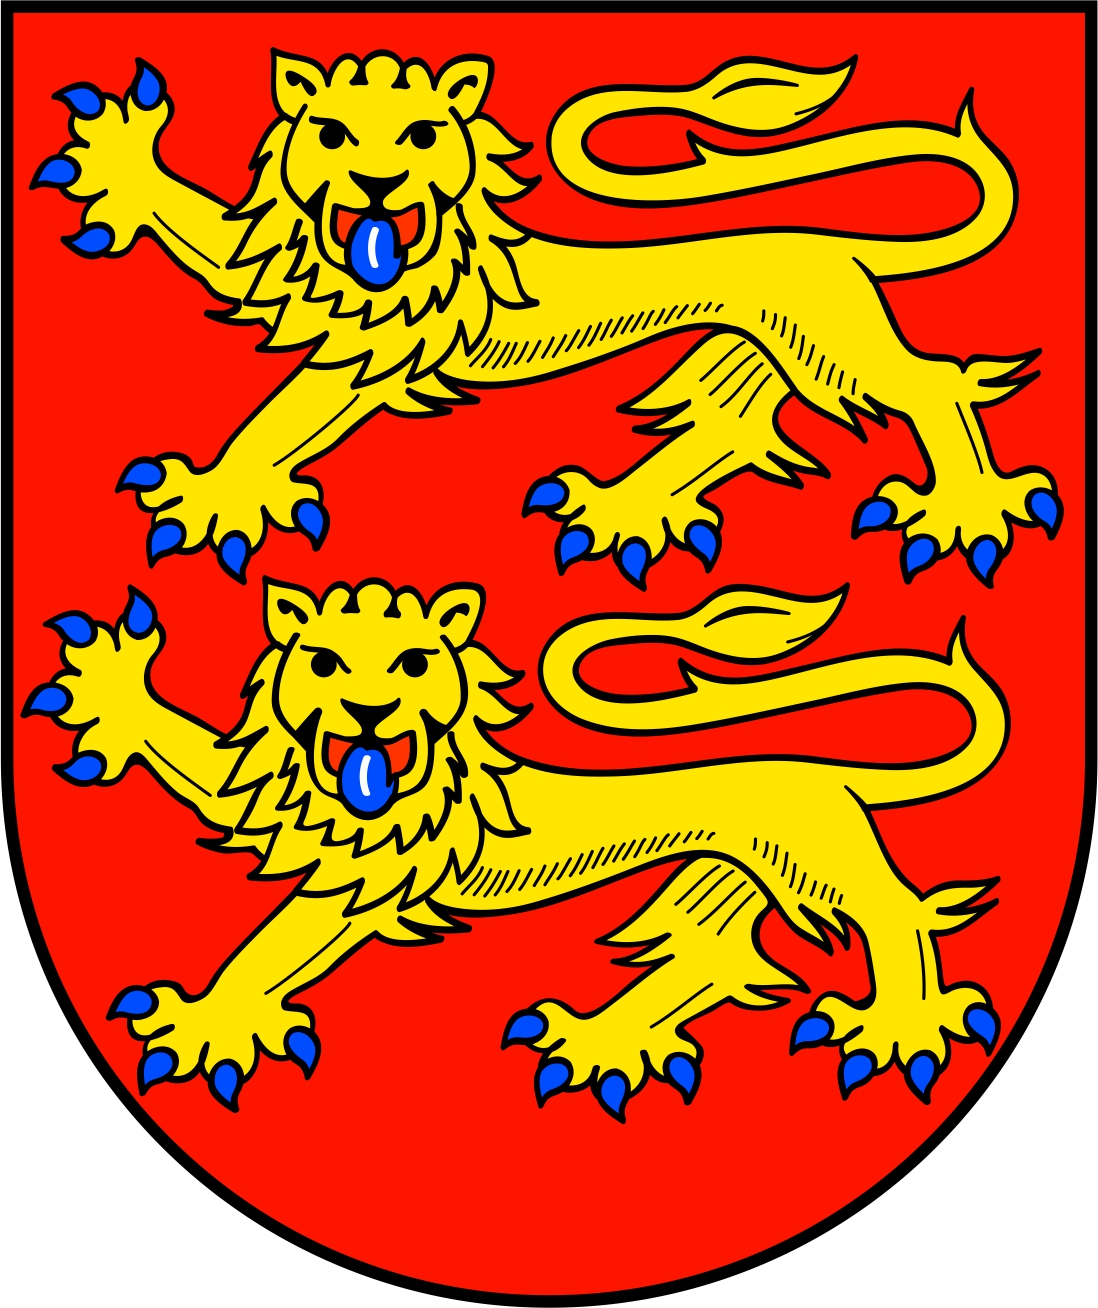 25-lecie partnerstwa gminy Kartuzy i miasta Duderstadt 10